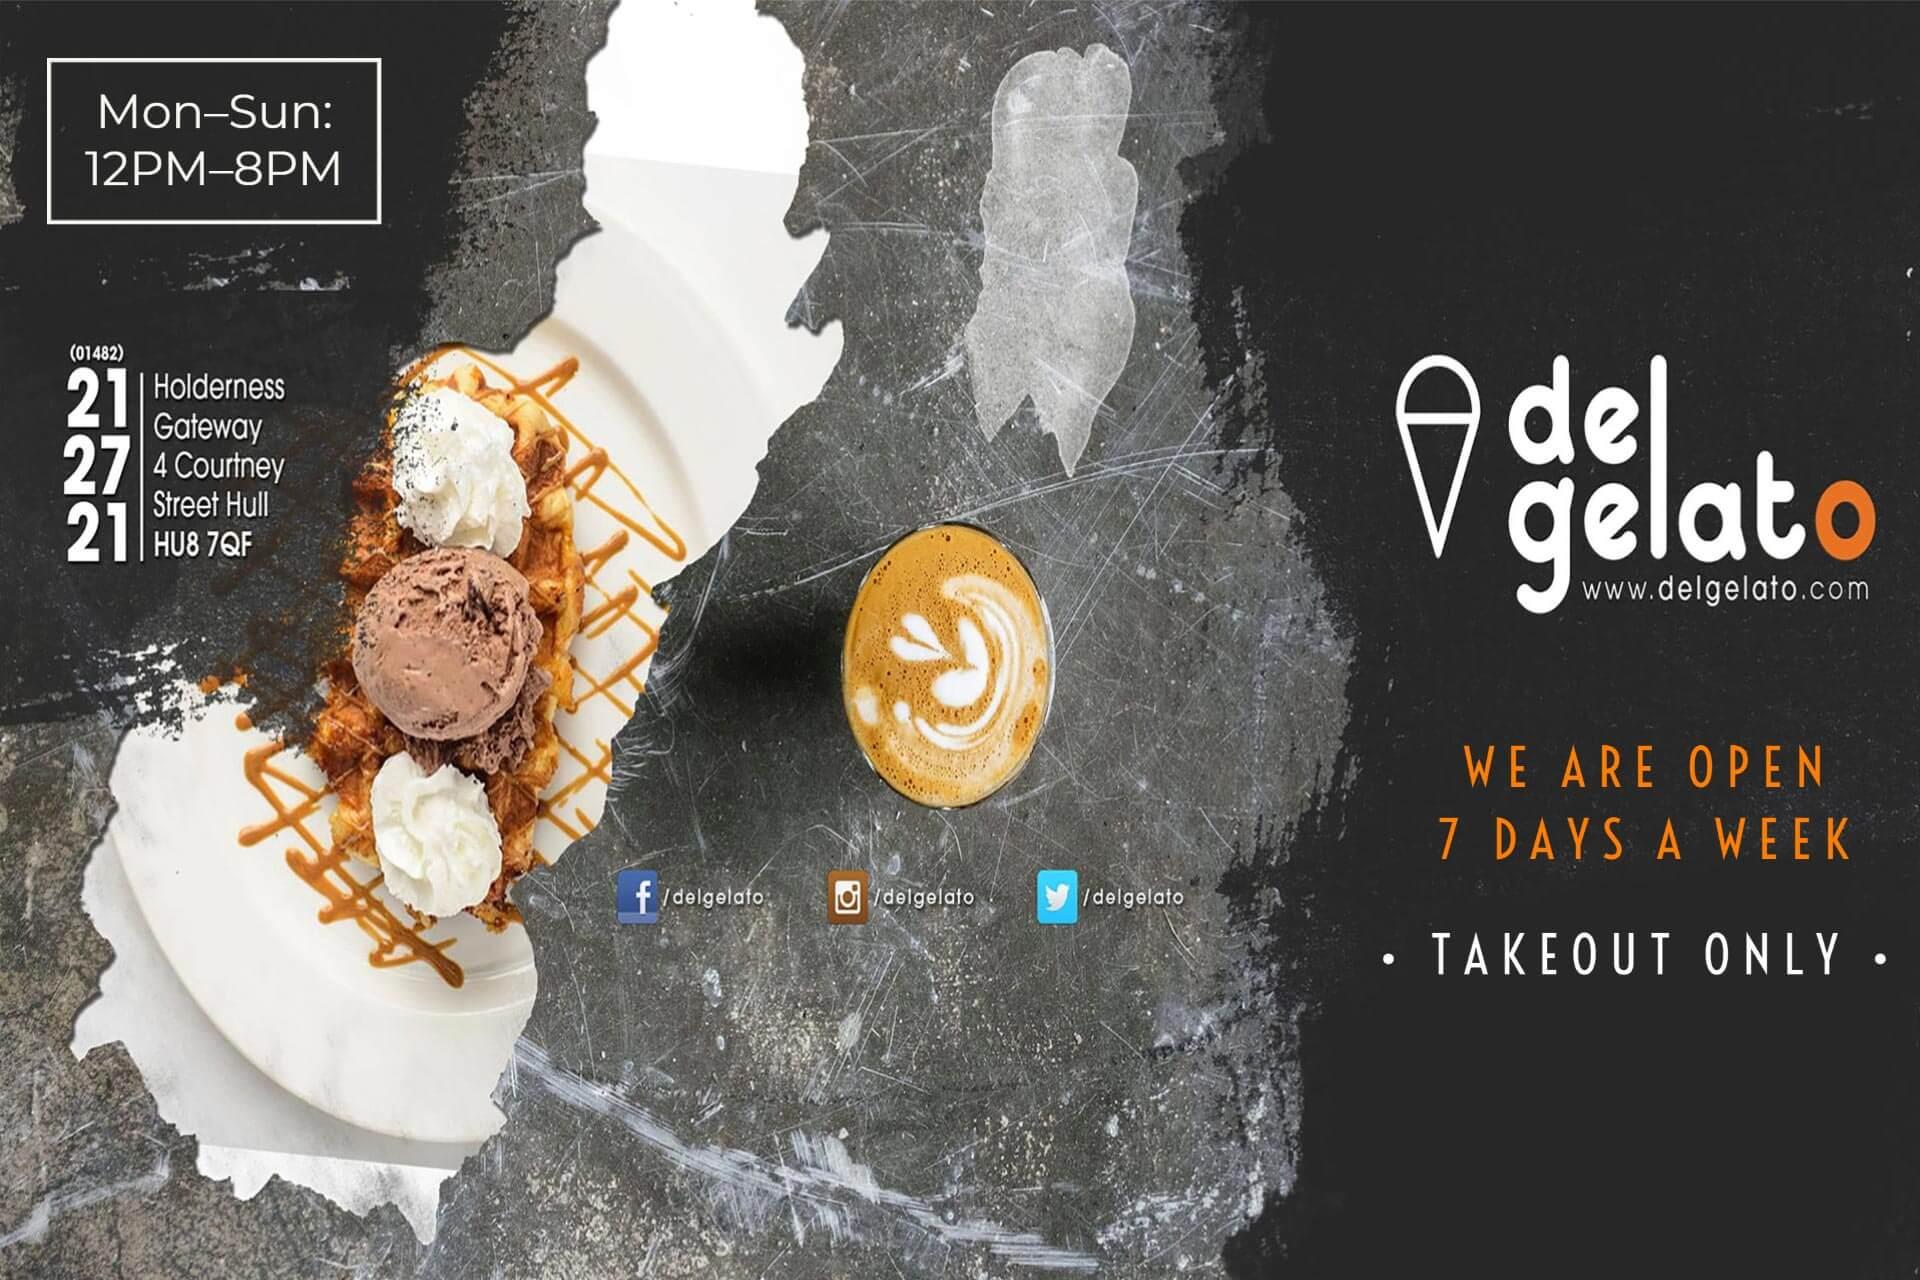 del-gelato-web-slide-two